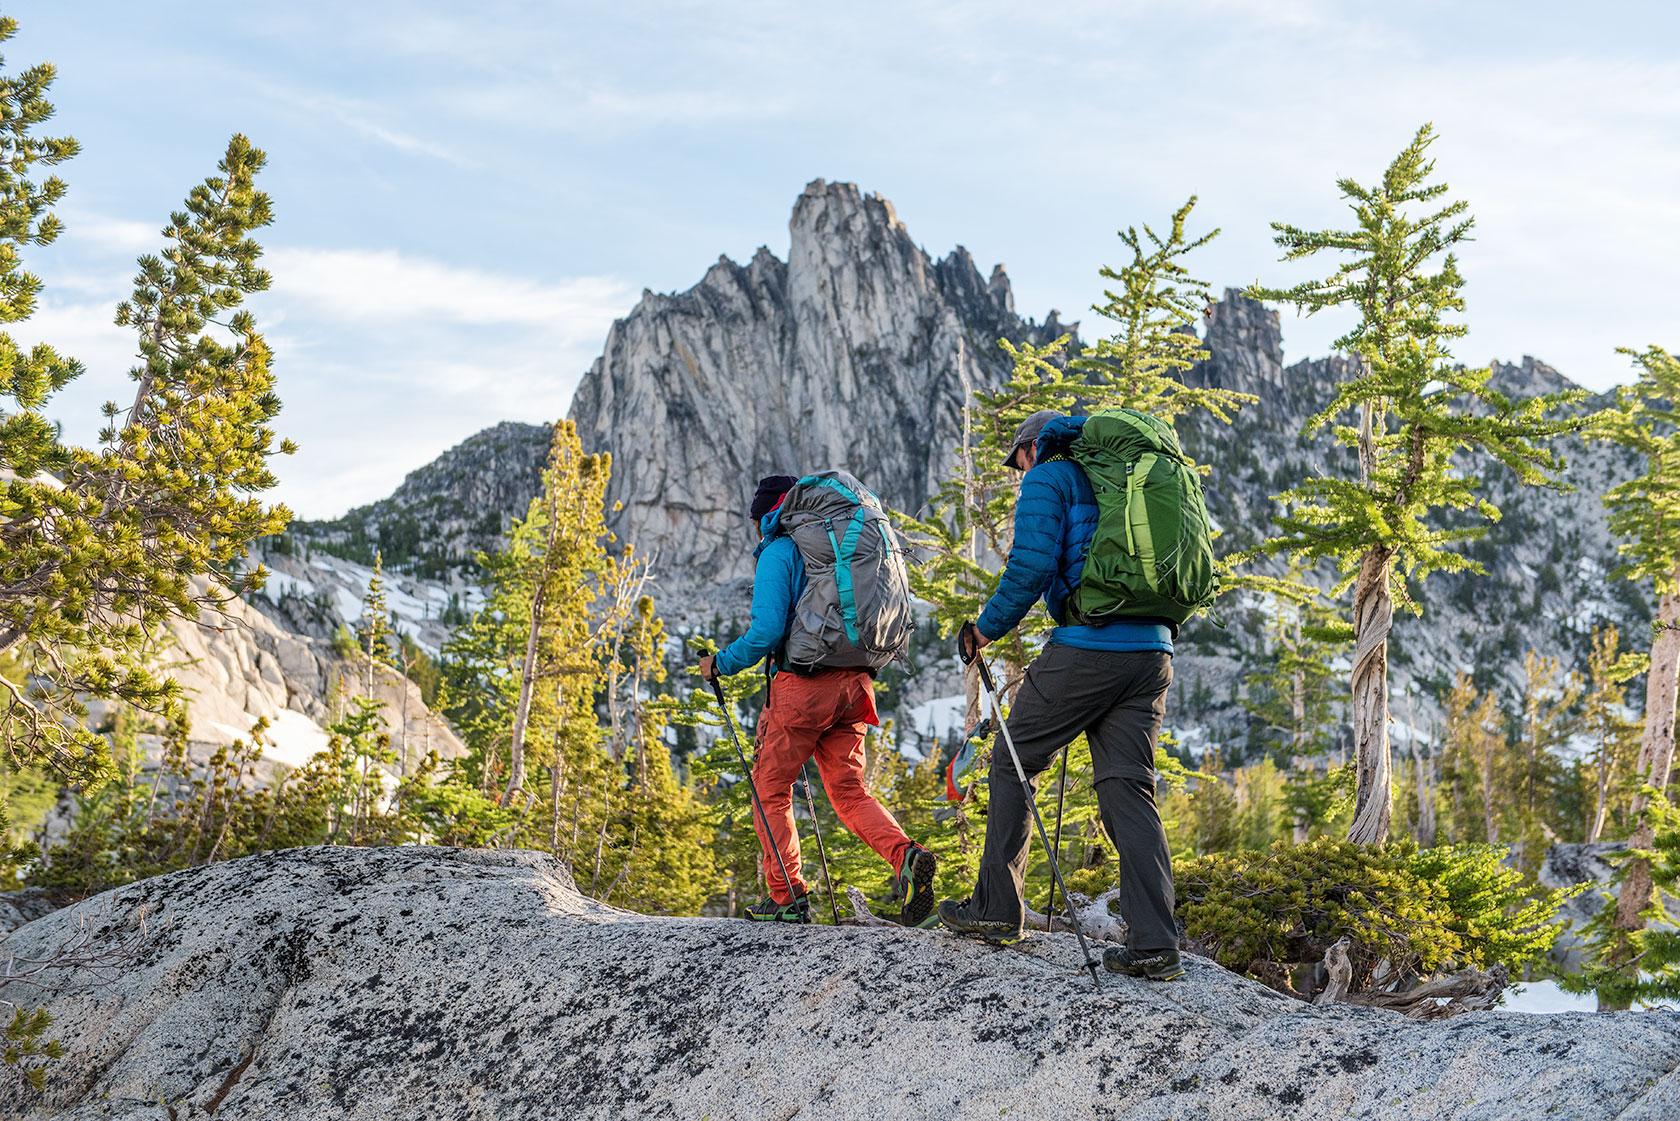 austin-trigg-osprey-hiking-backpacks-prusik-peak-alpine-lake-wilderness-hike-camp-washington-adventure-morning-sunrise-lifestyle-outdoor-enchantments.jpg